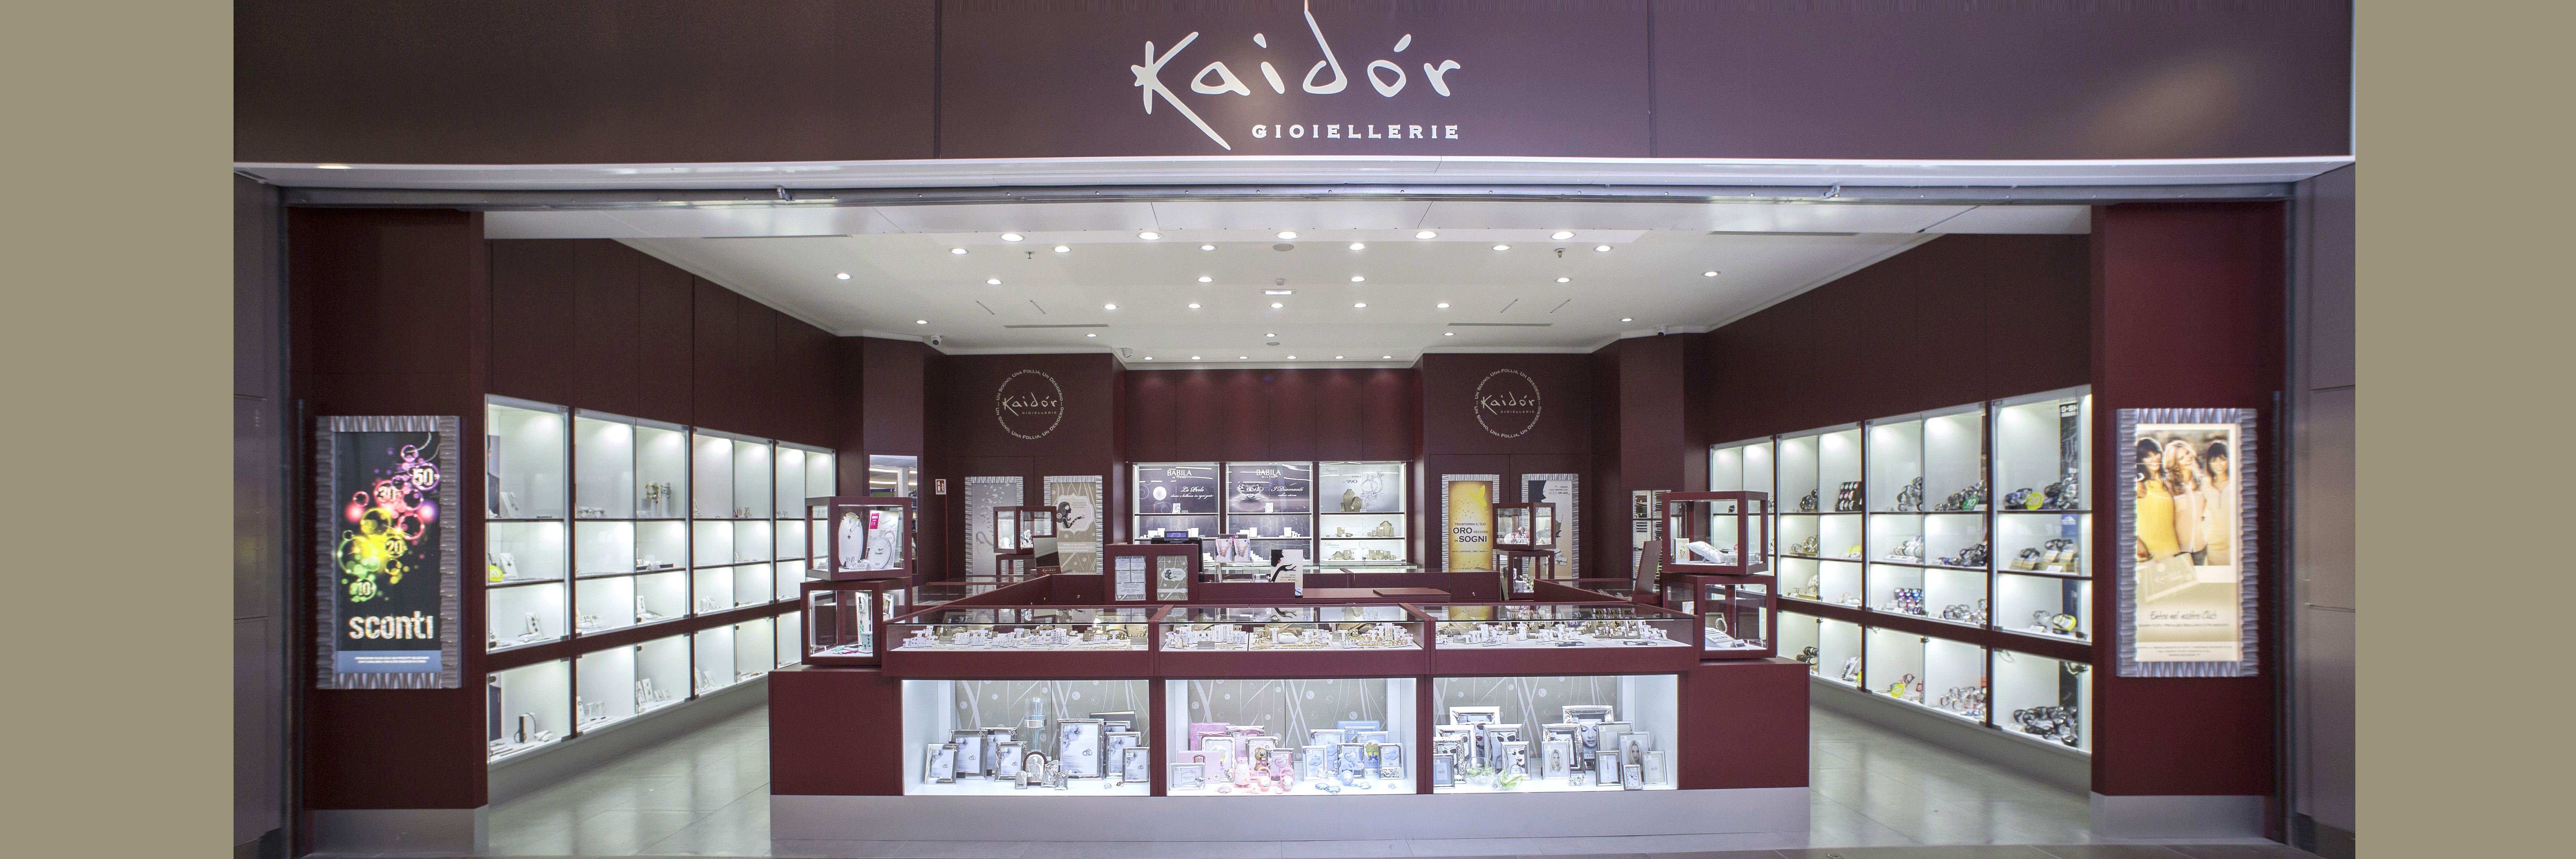 http://www.kaidor.it/wp-content/uploads/CASTELLANZA.jpg